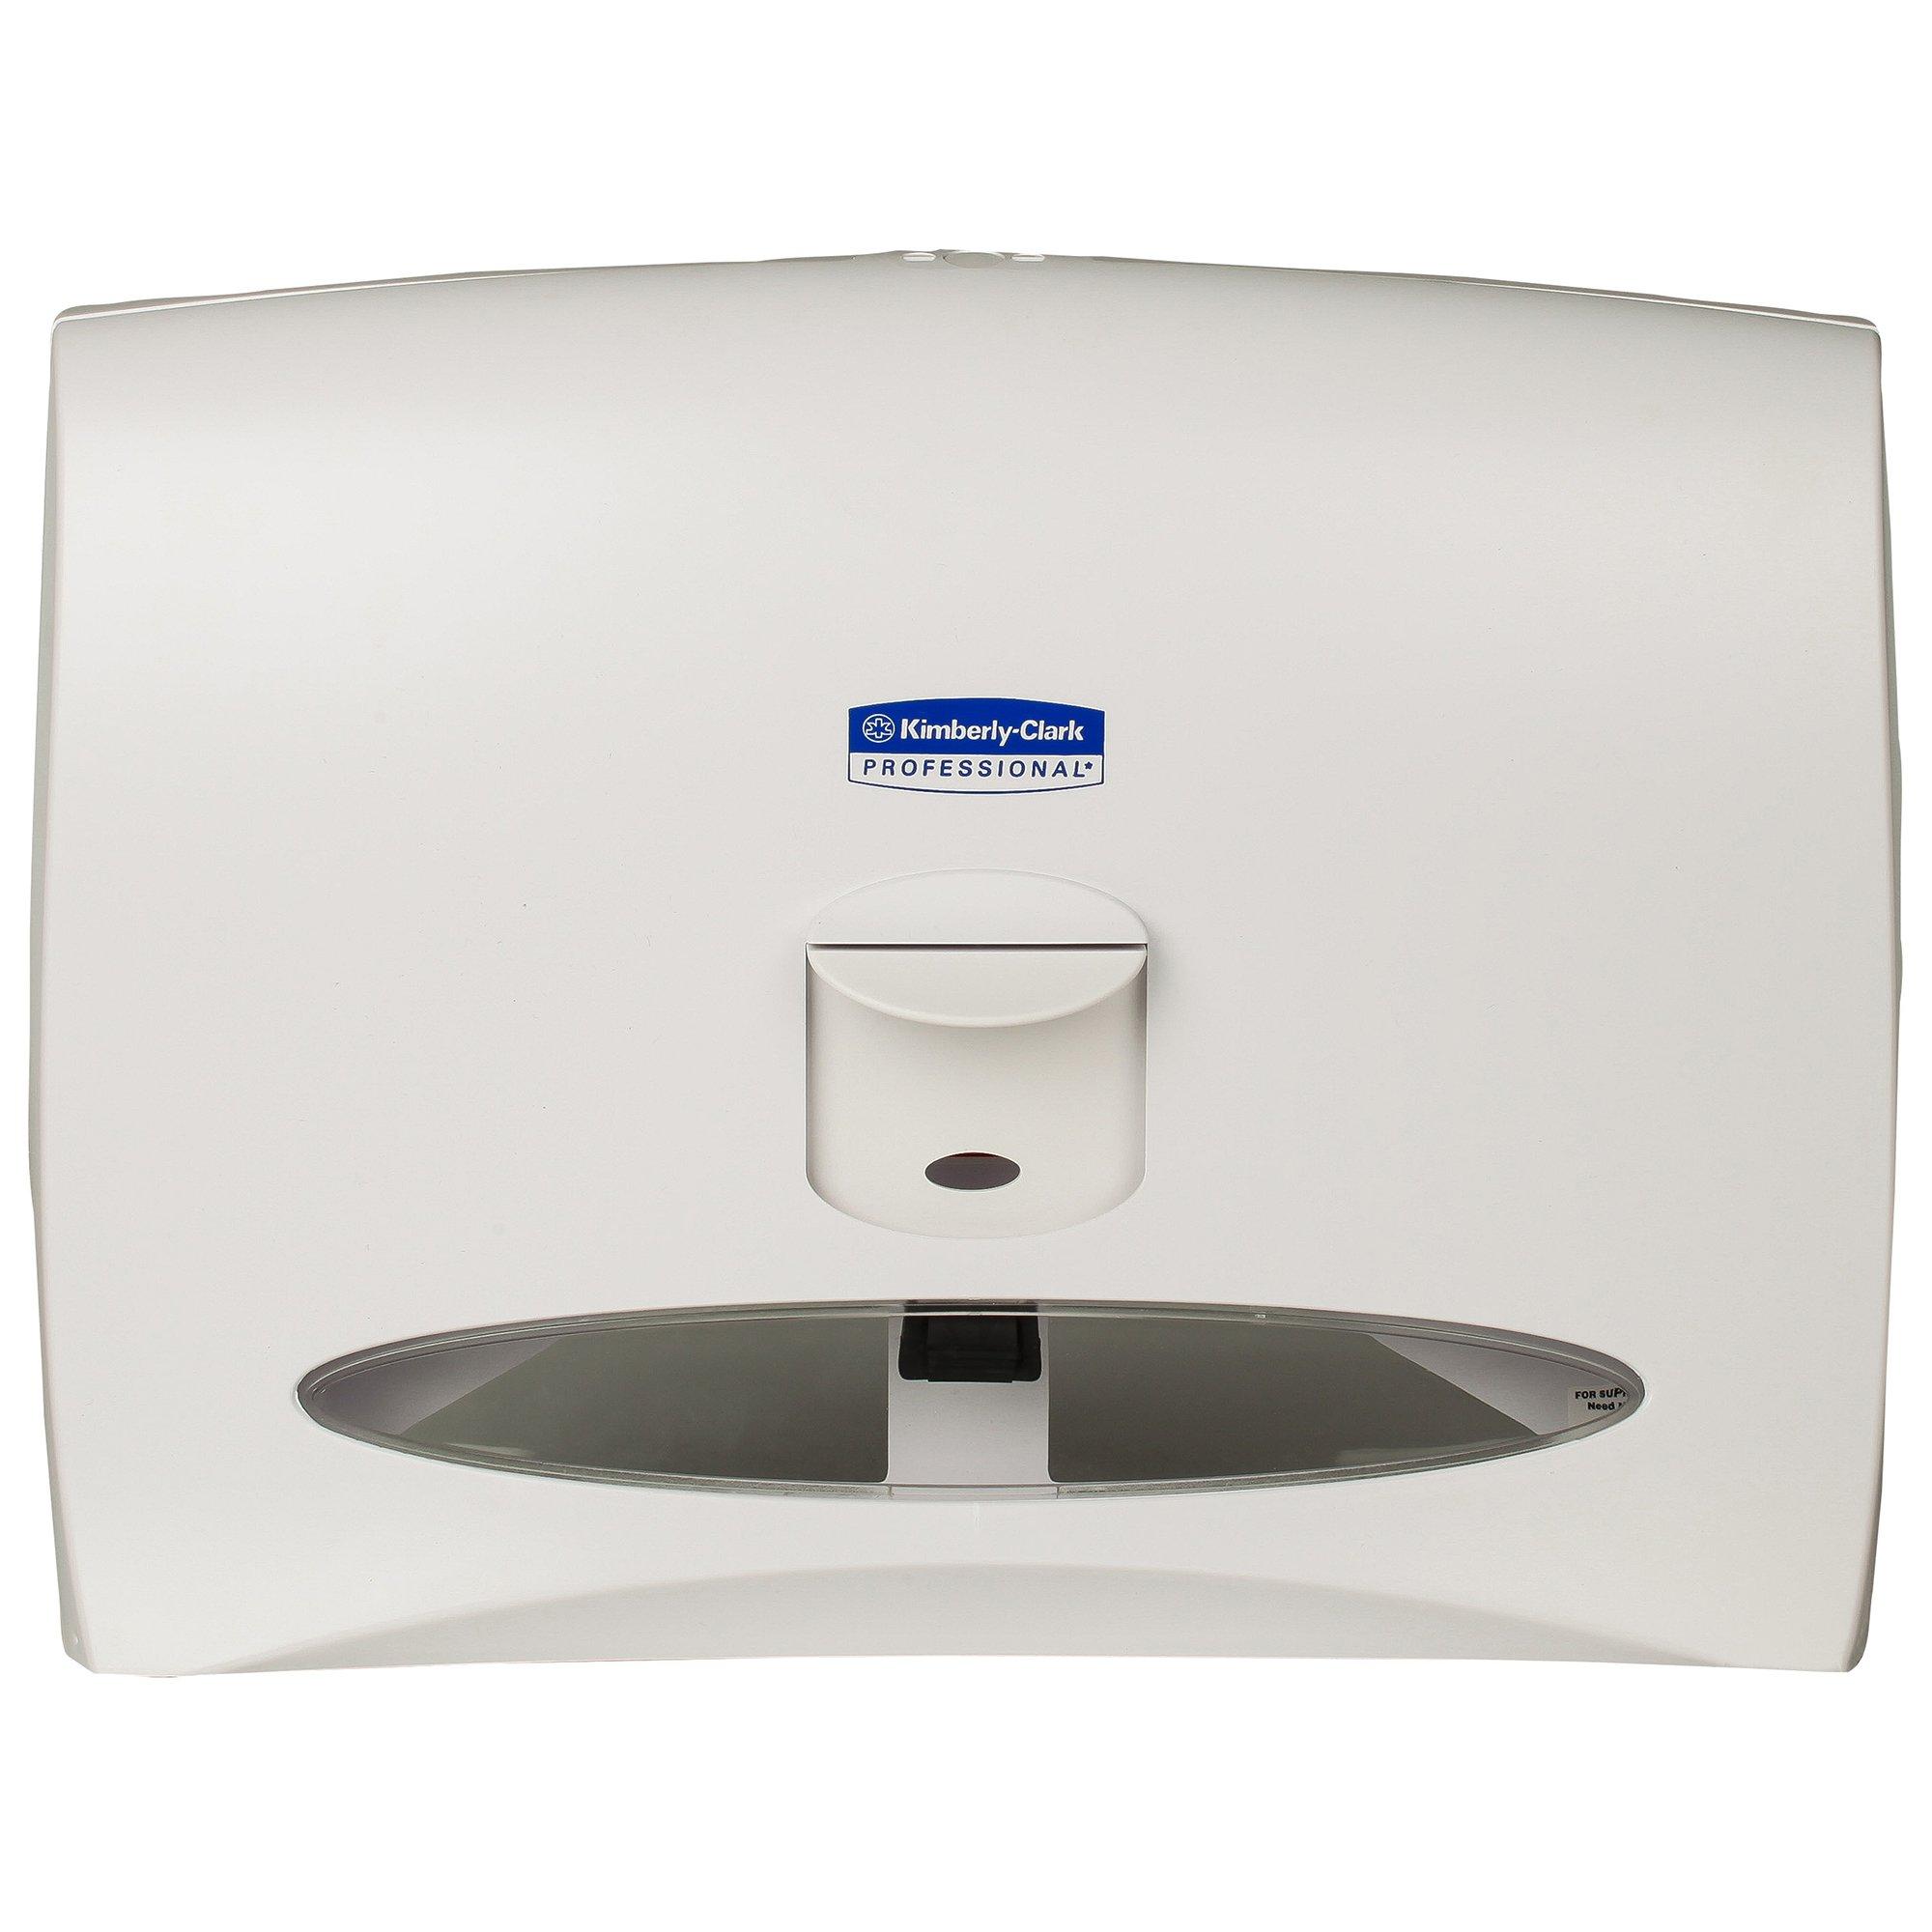 WINDOWS 09505 White Toilet Seat Cover Dispenser